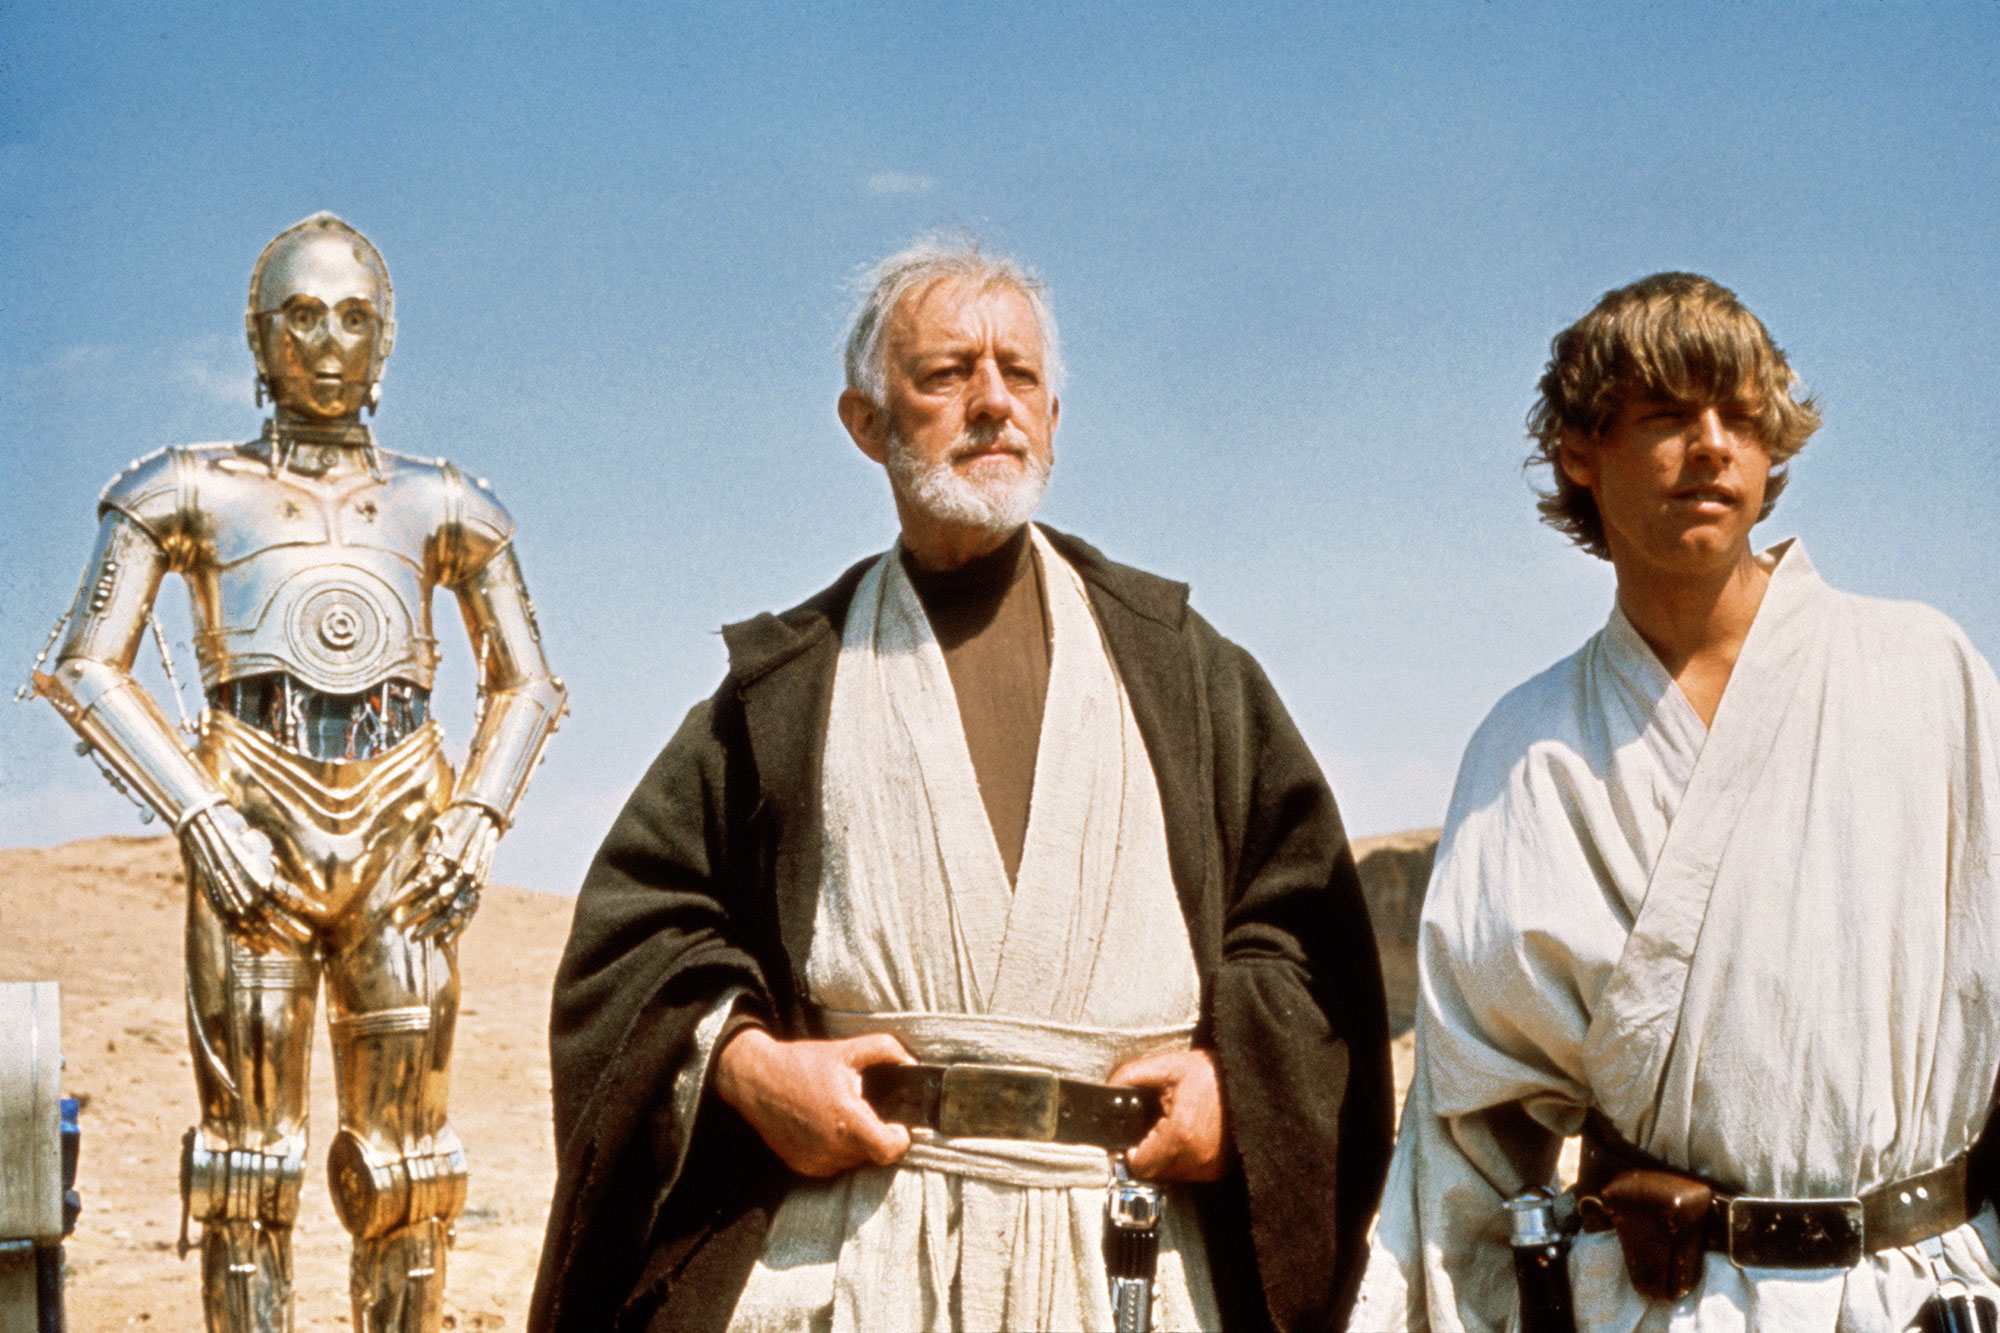 Star Wars: A New Hope Episode IV